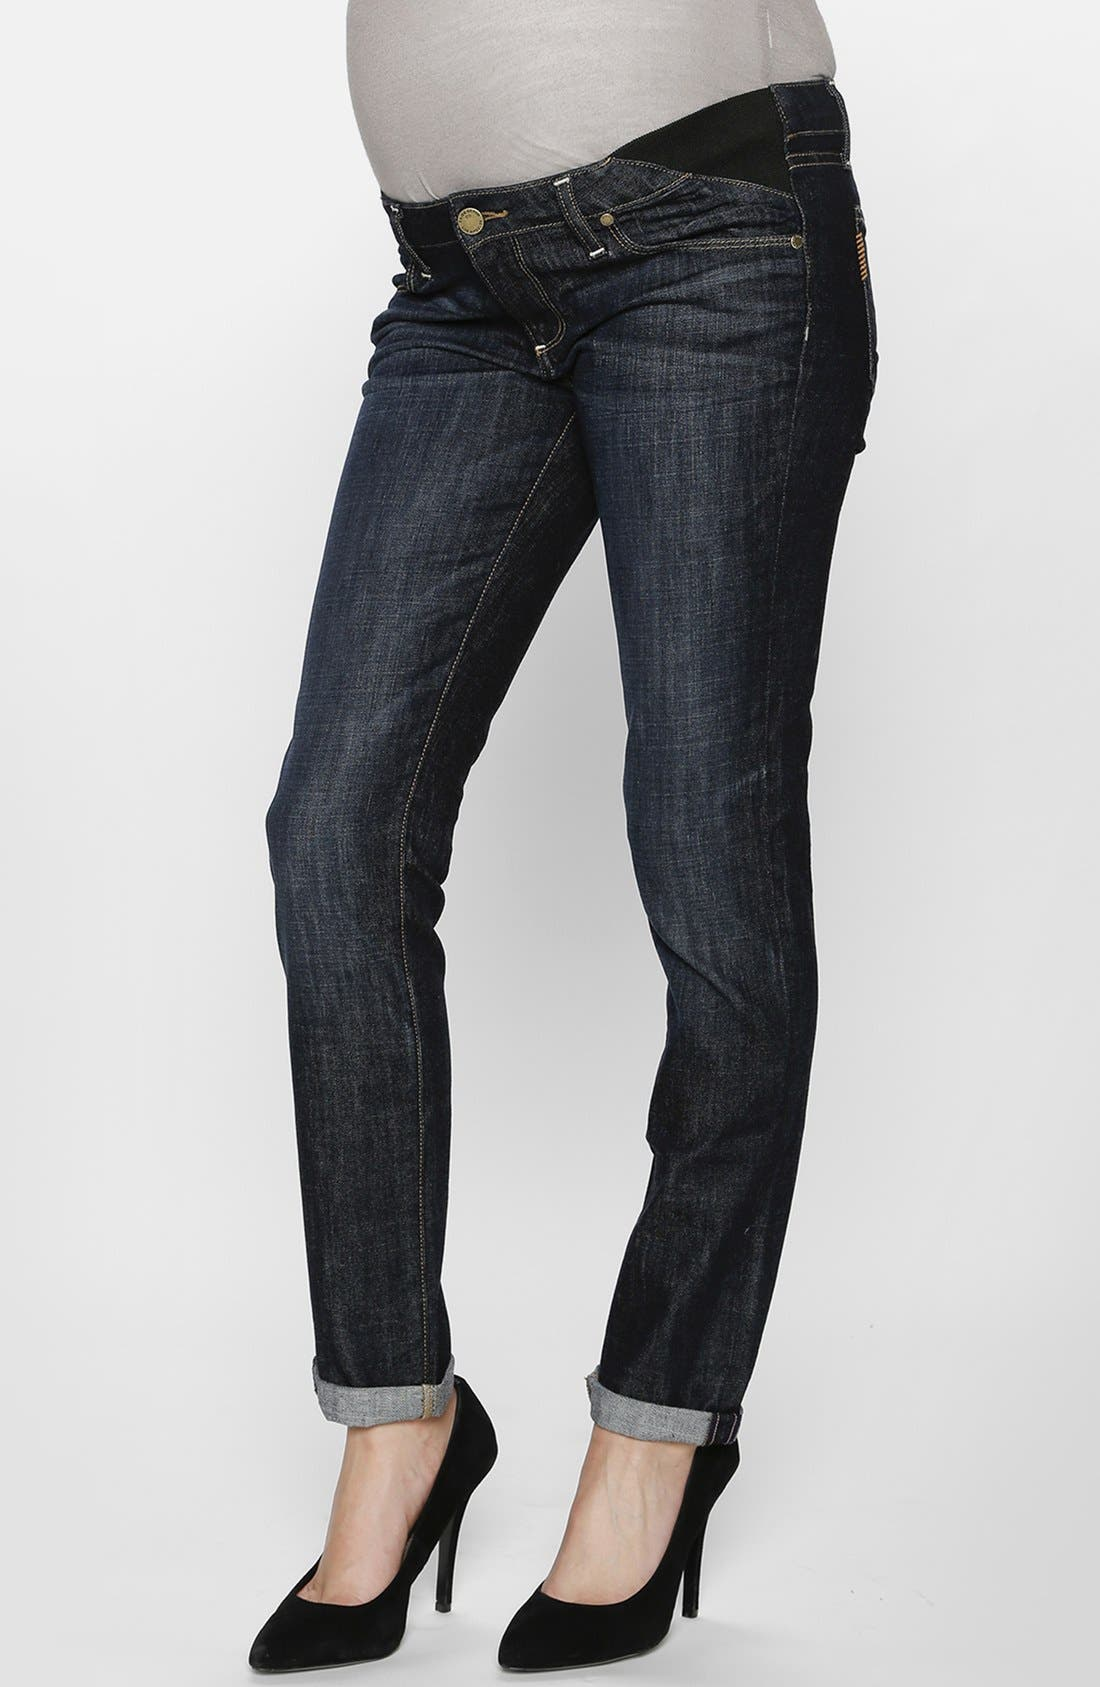 Alternate Image 1 Selected - Paige Denim 'Jimmy Jimmy' Skinny Boyfriend Maternity Jeans (Blue)